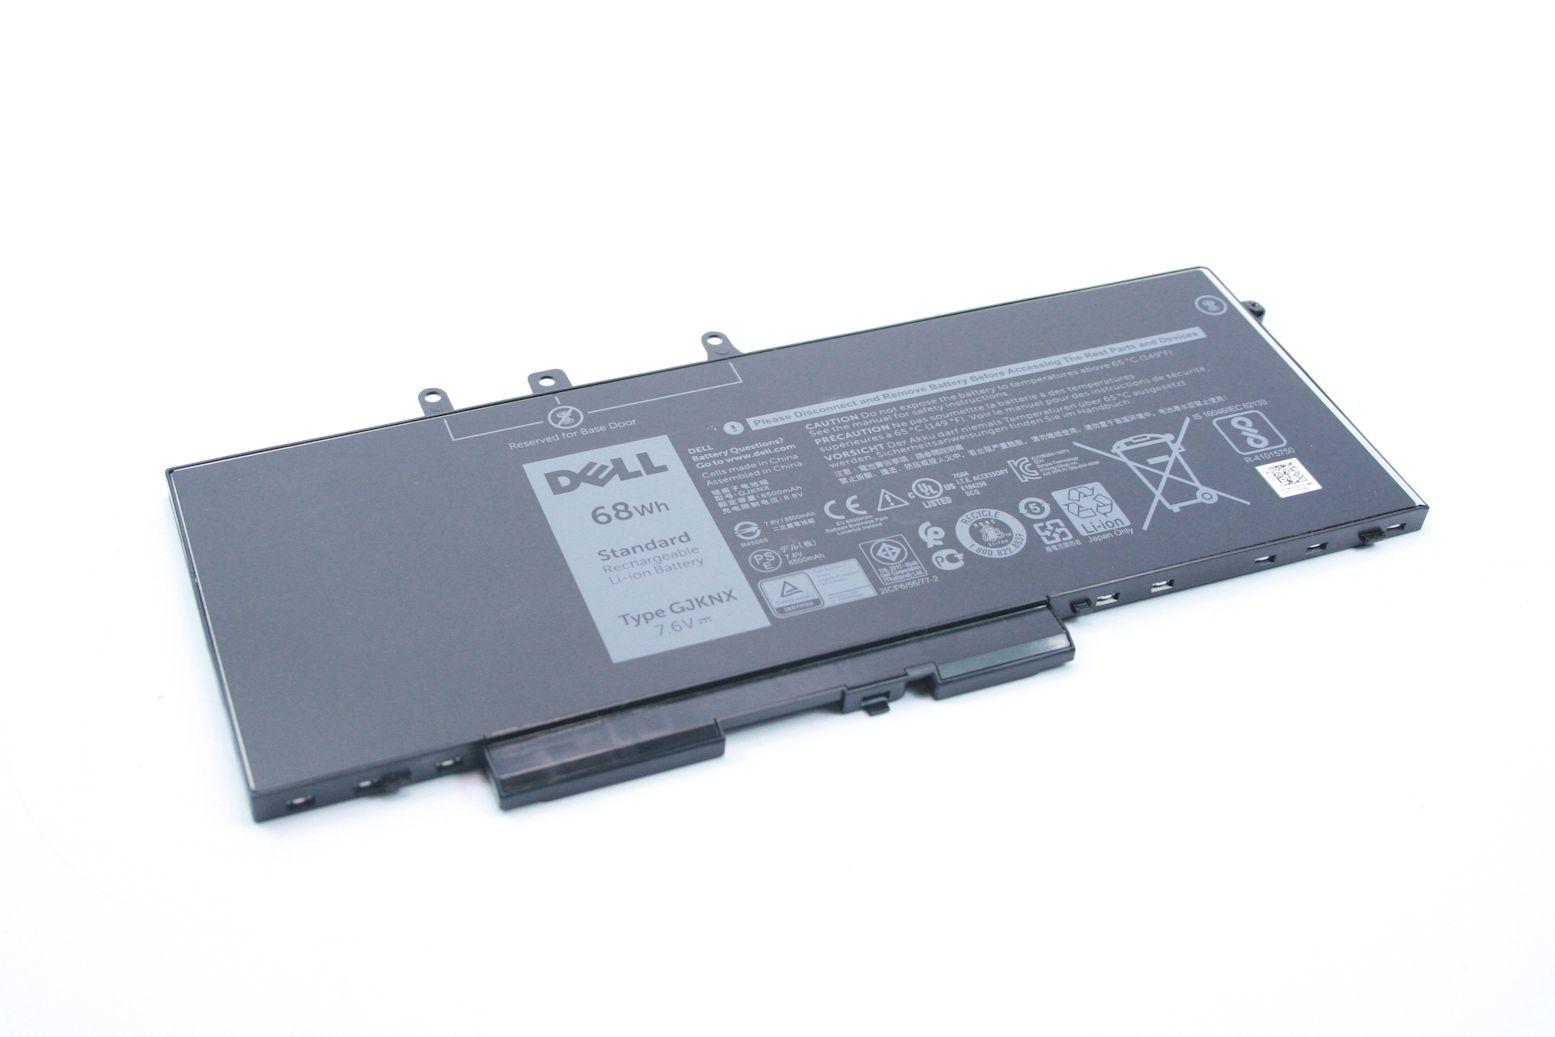 DELL Latitude Precision 5490 5480 68Wh Akku Battery Batterie KCM82